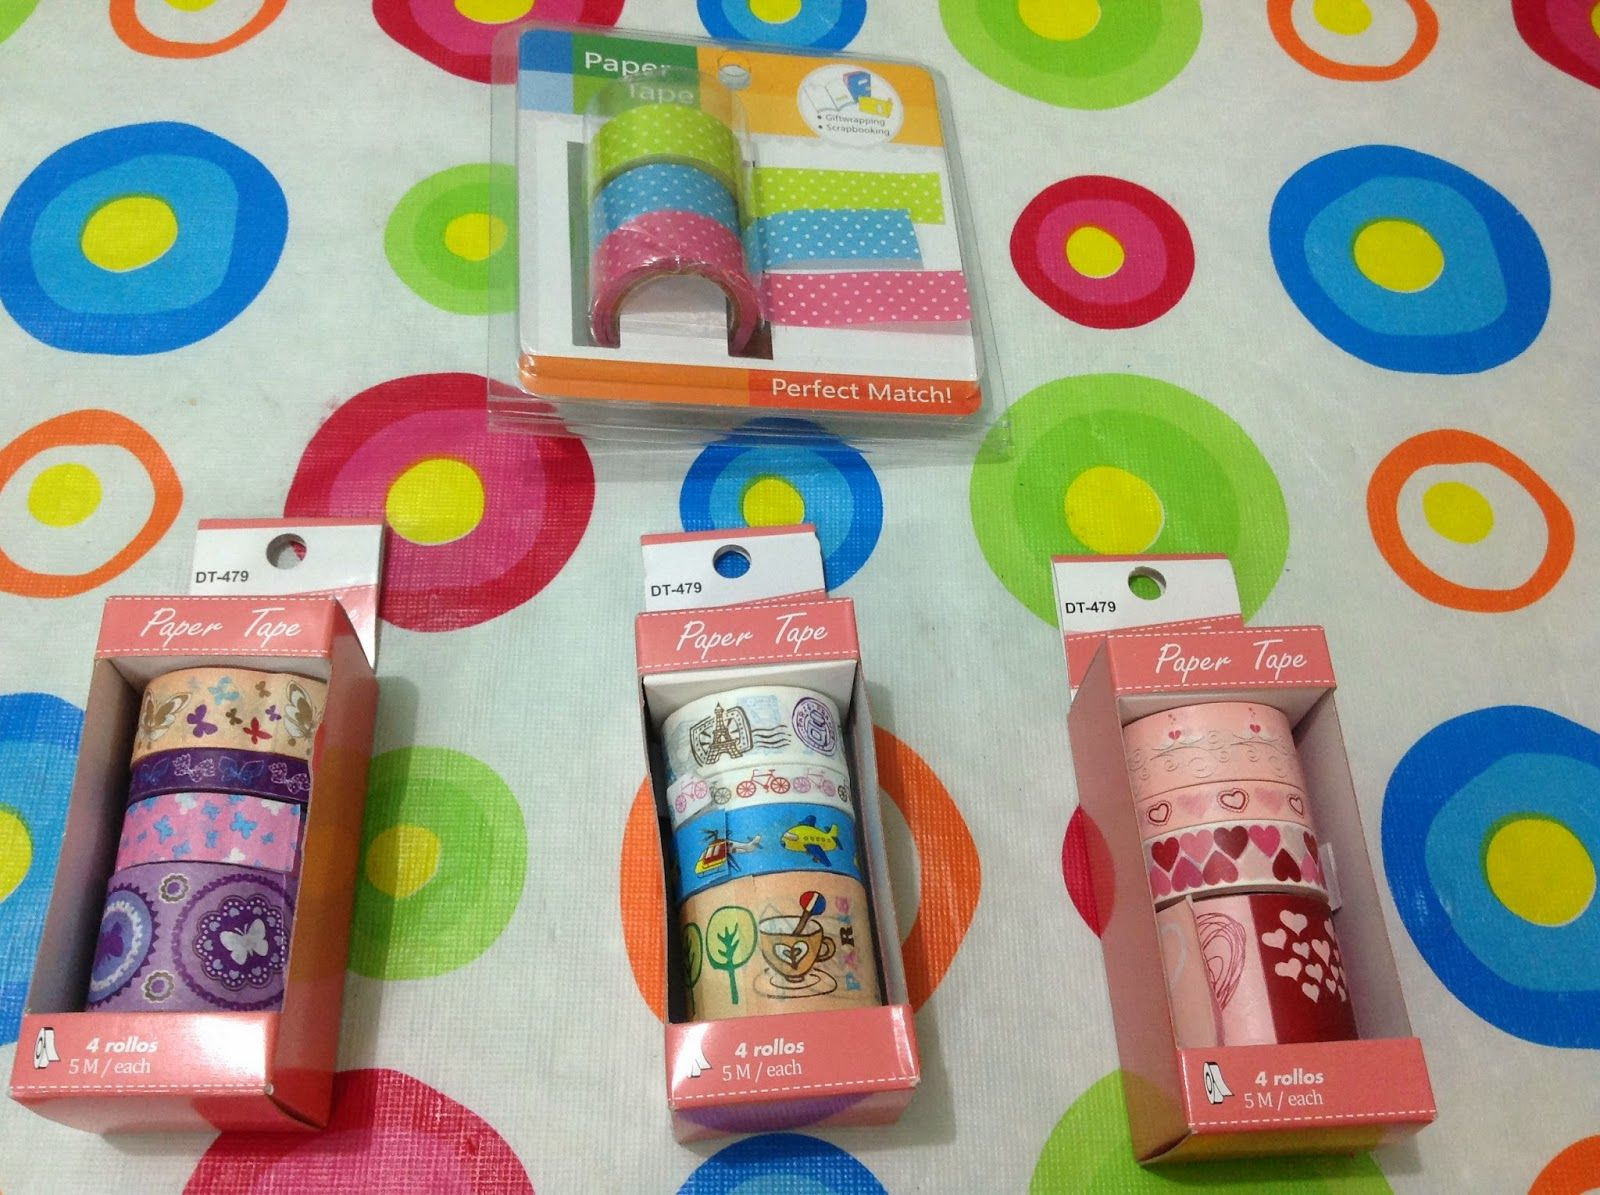 How to scrapbook materials - Paper Craft Scrapbook Supplies Wellmanson Quiapo